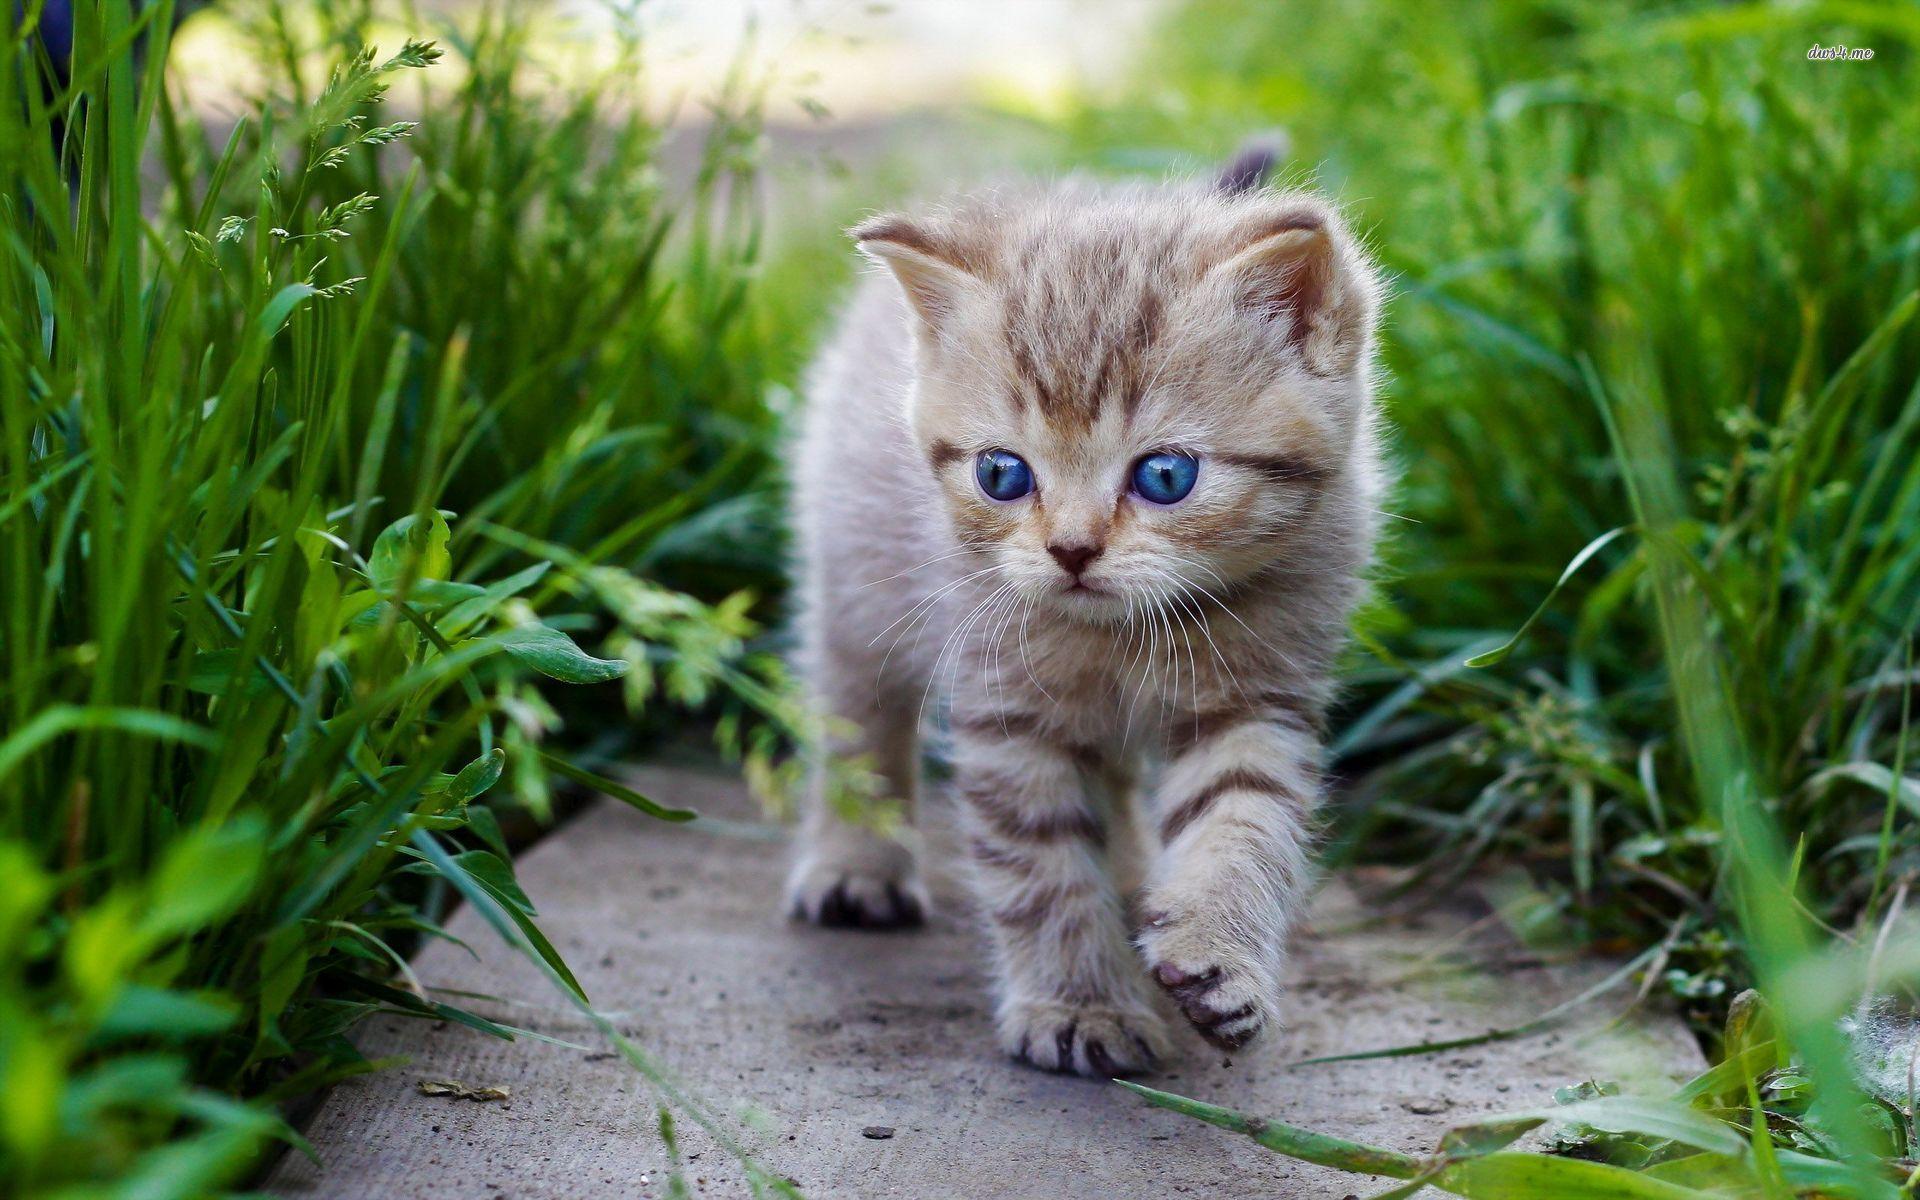 Cute Baby Cat wallpaper Animal wallpapers 27967